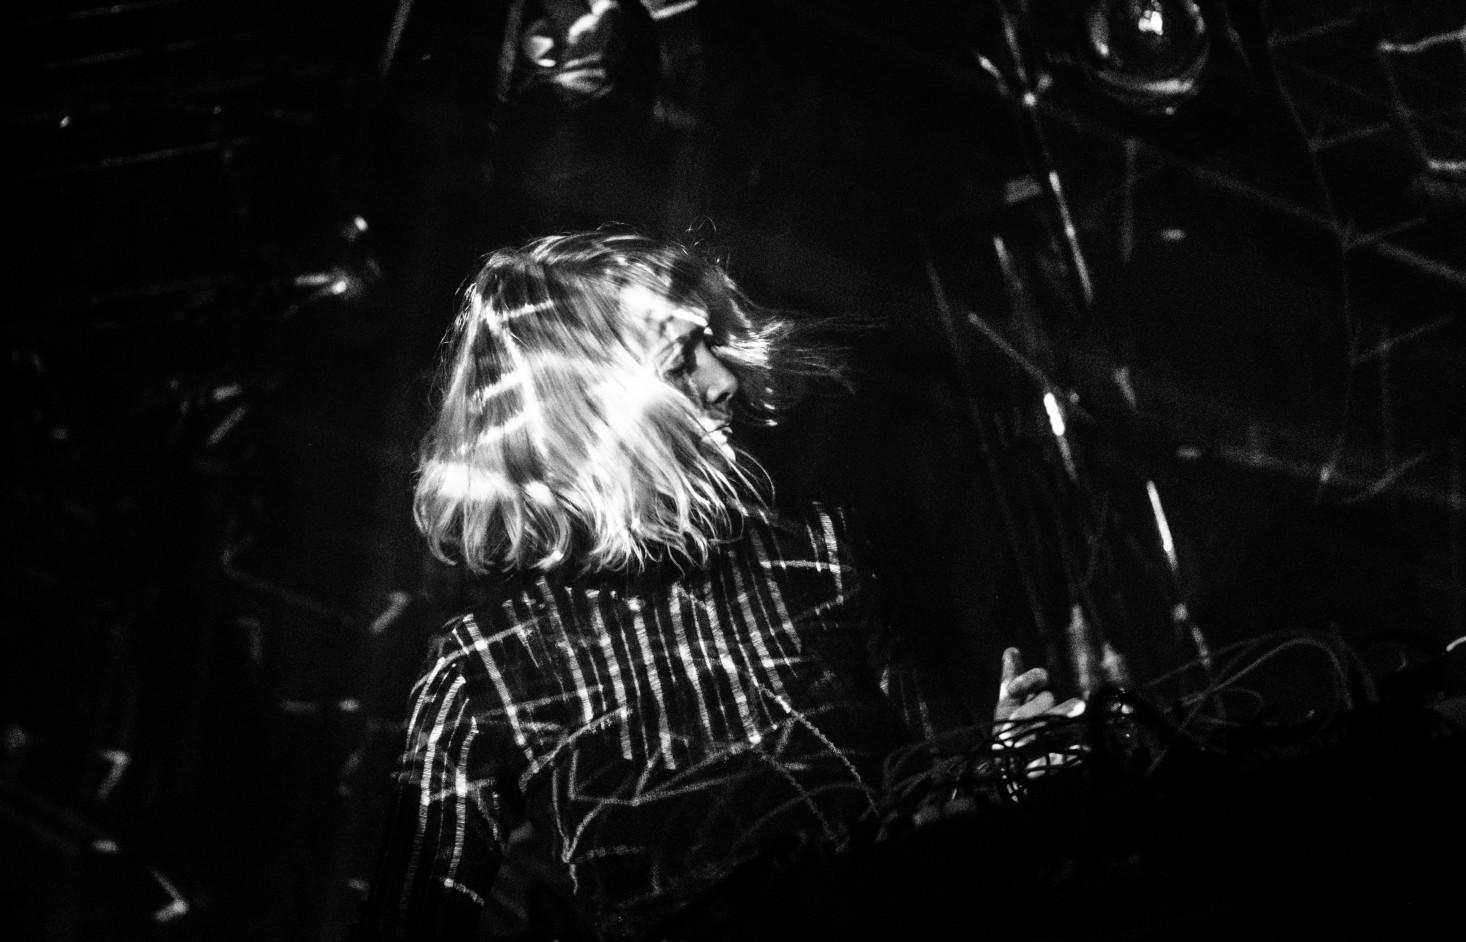 Vinterjazz & artFREQ presents Kraut Remixed feat. SØS Gunver Ryberg & Cristian Vogel